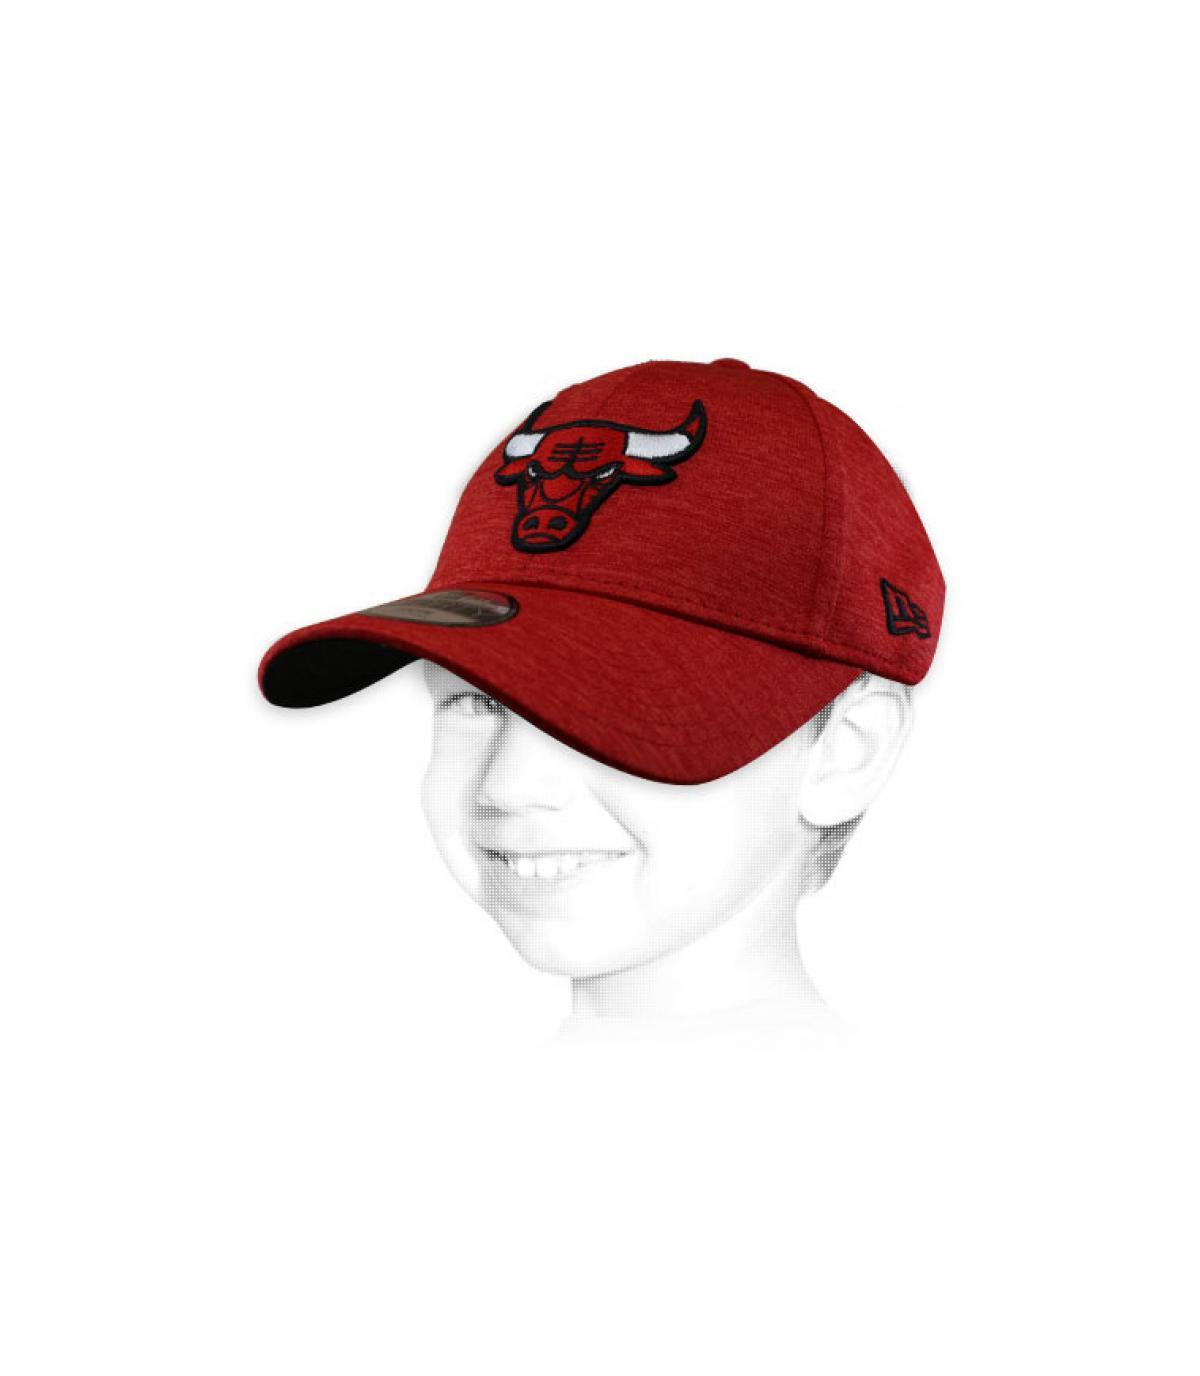 Bulls red kid cap